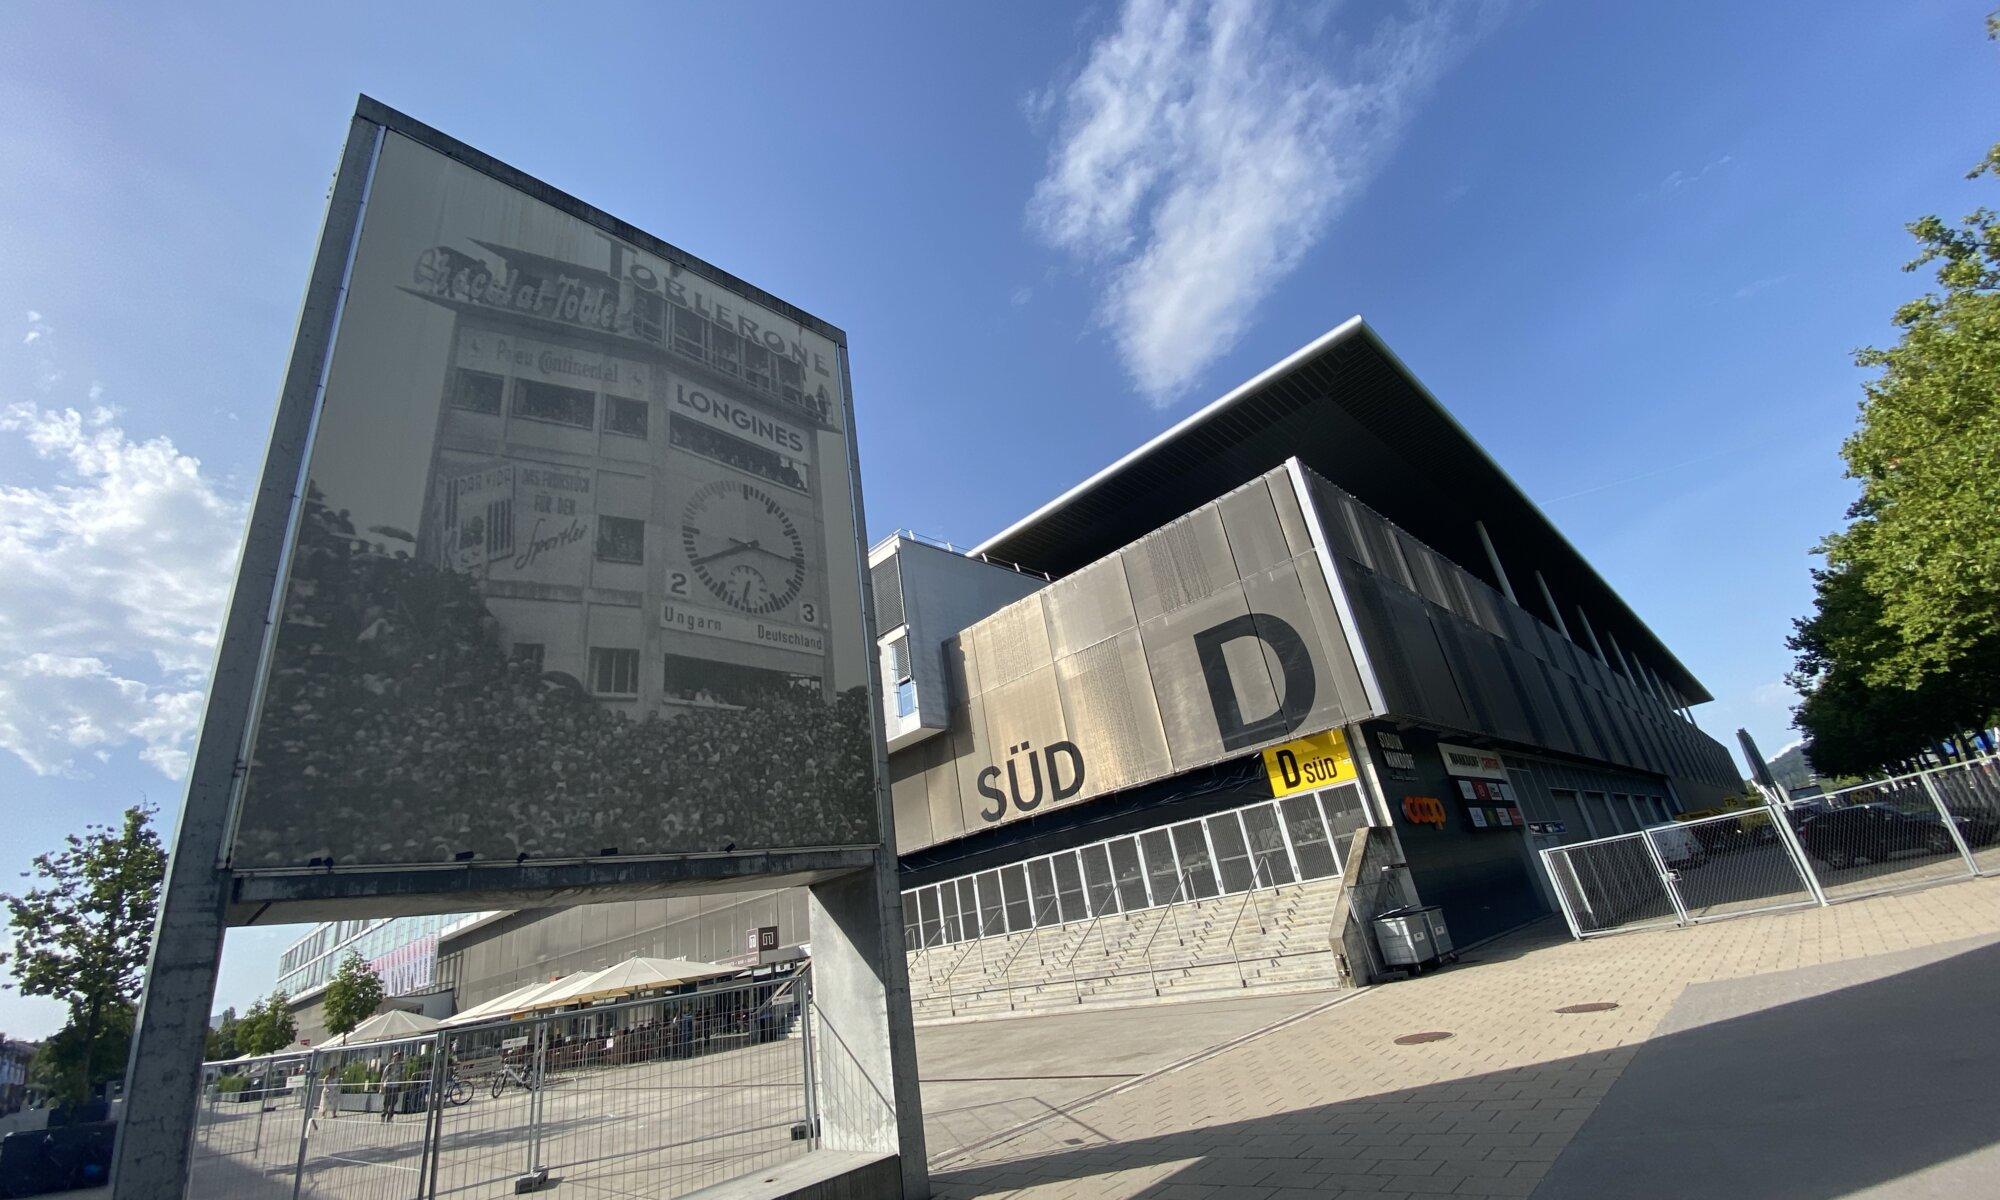 Wankdorfstadion, Bern